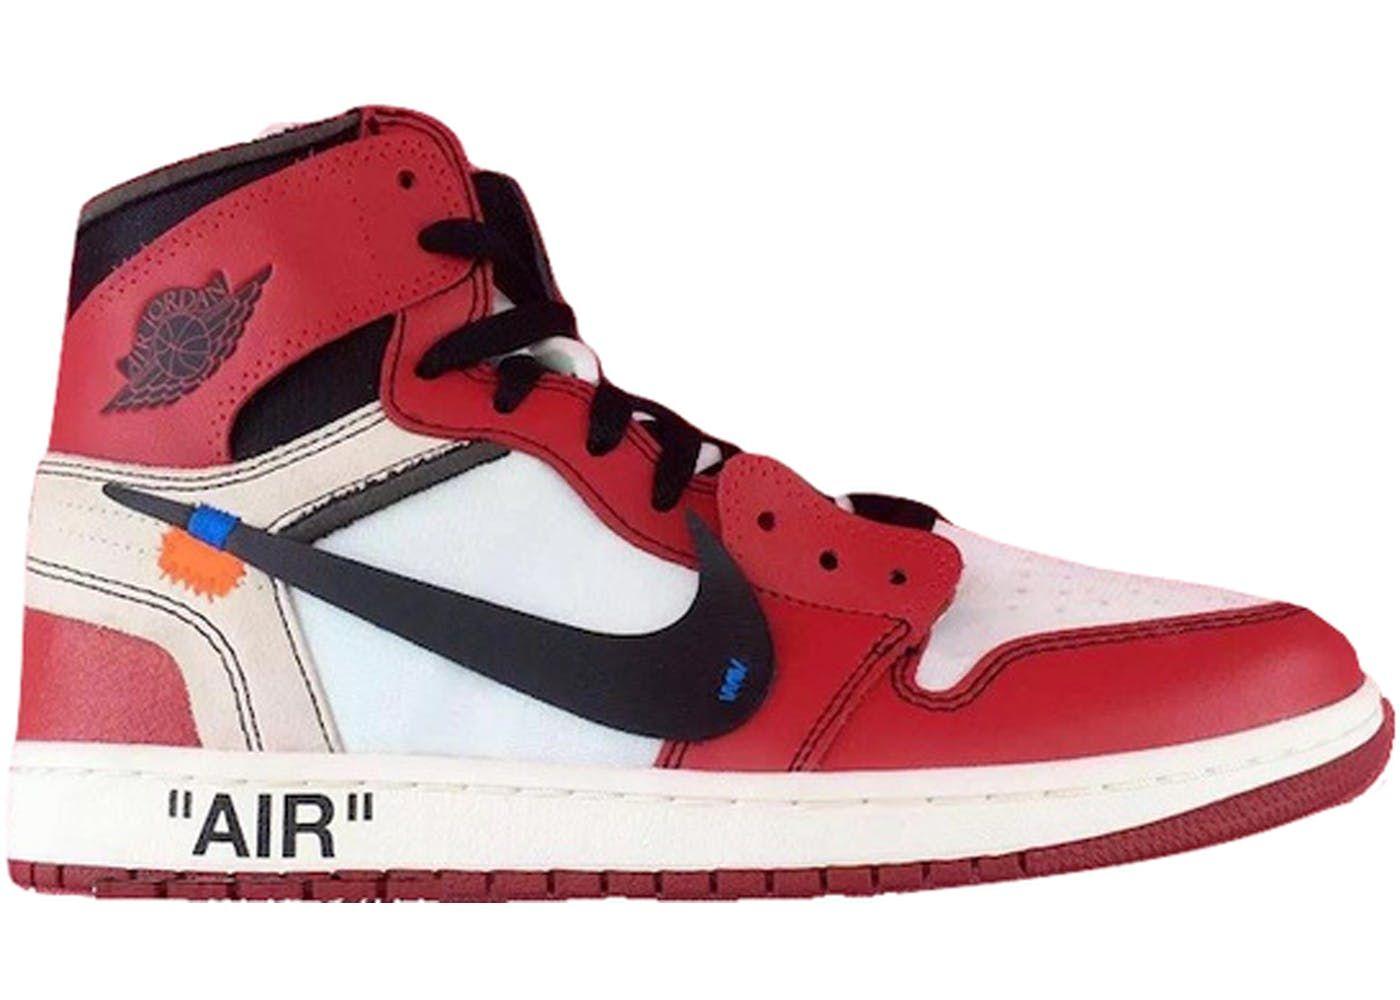 on sale 108ad d879f Jordan 1 Retro High Off-White Chicago   Top sneaker Picks ...